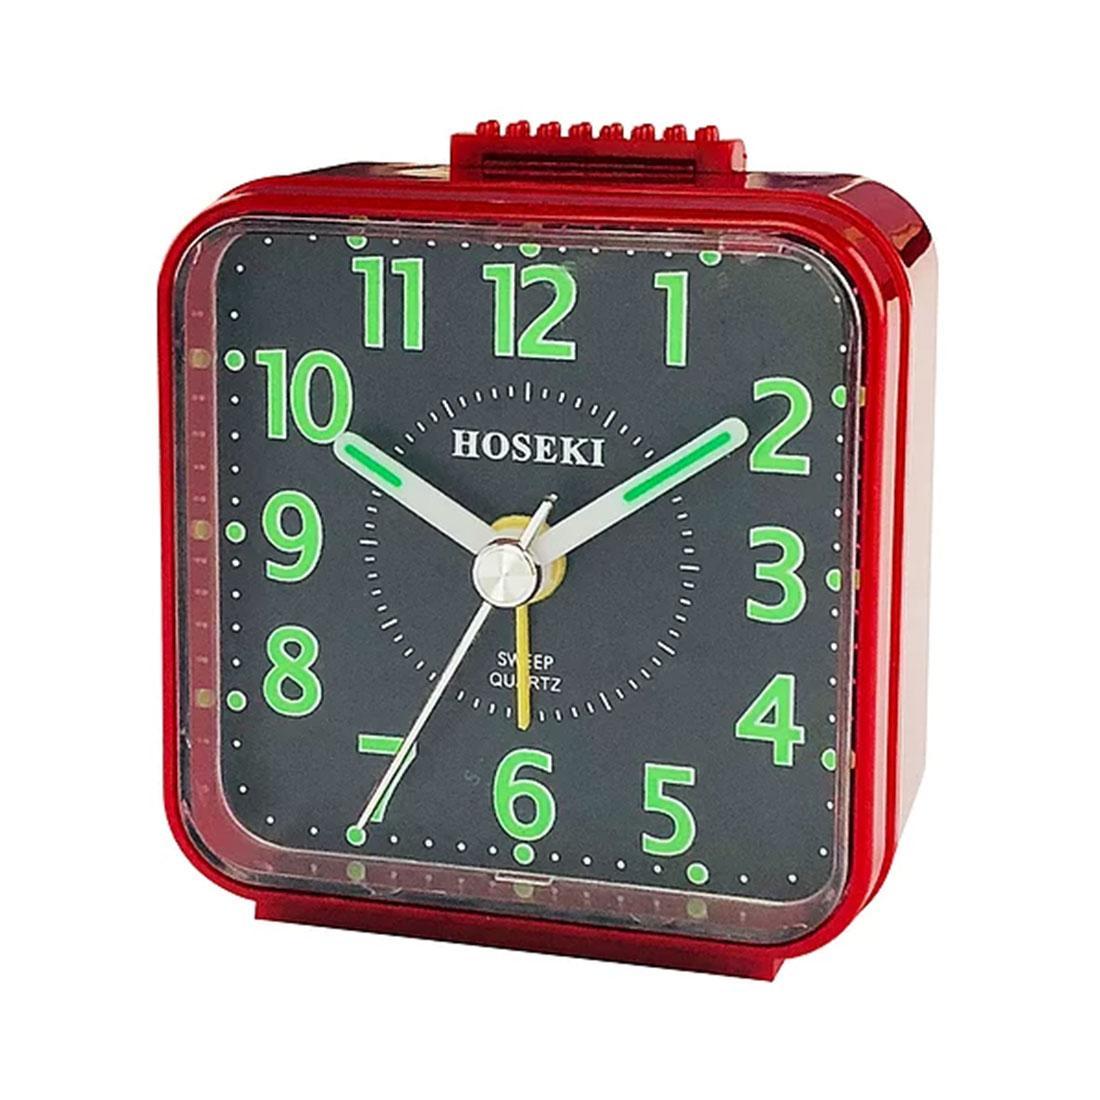 Hoseki Sweep Quartz H-9064R/BK H-9064 Red Black Square Analog Beep Alarm Clock